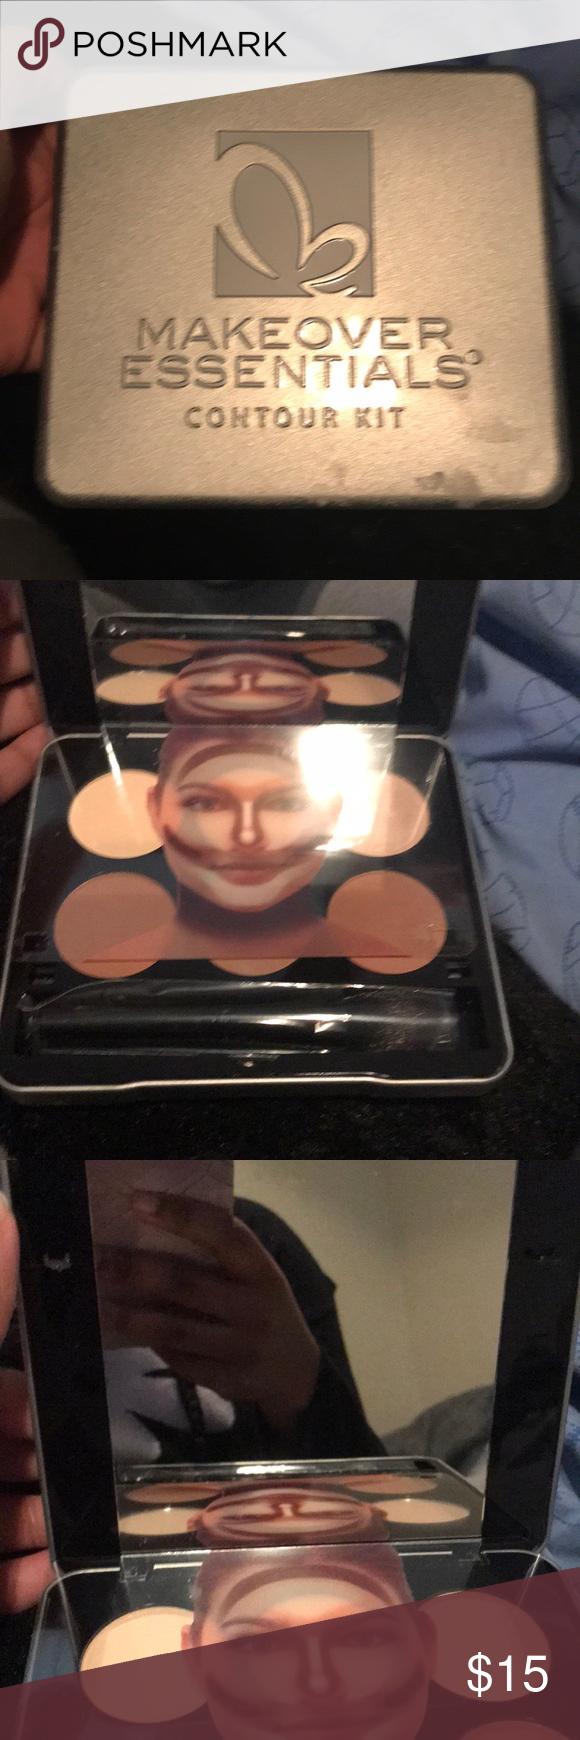 Contour kit Medium to dark brand new makeover essentials